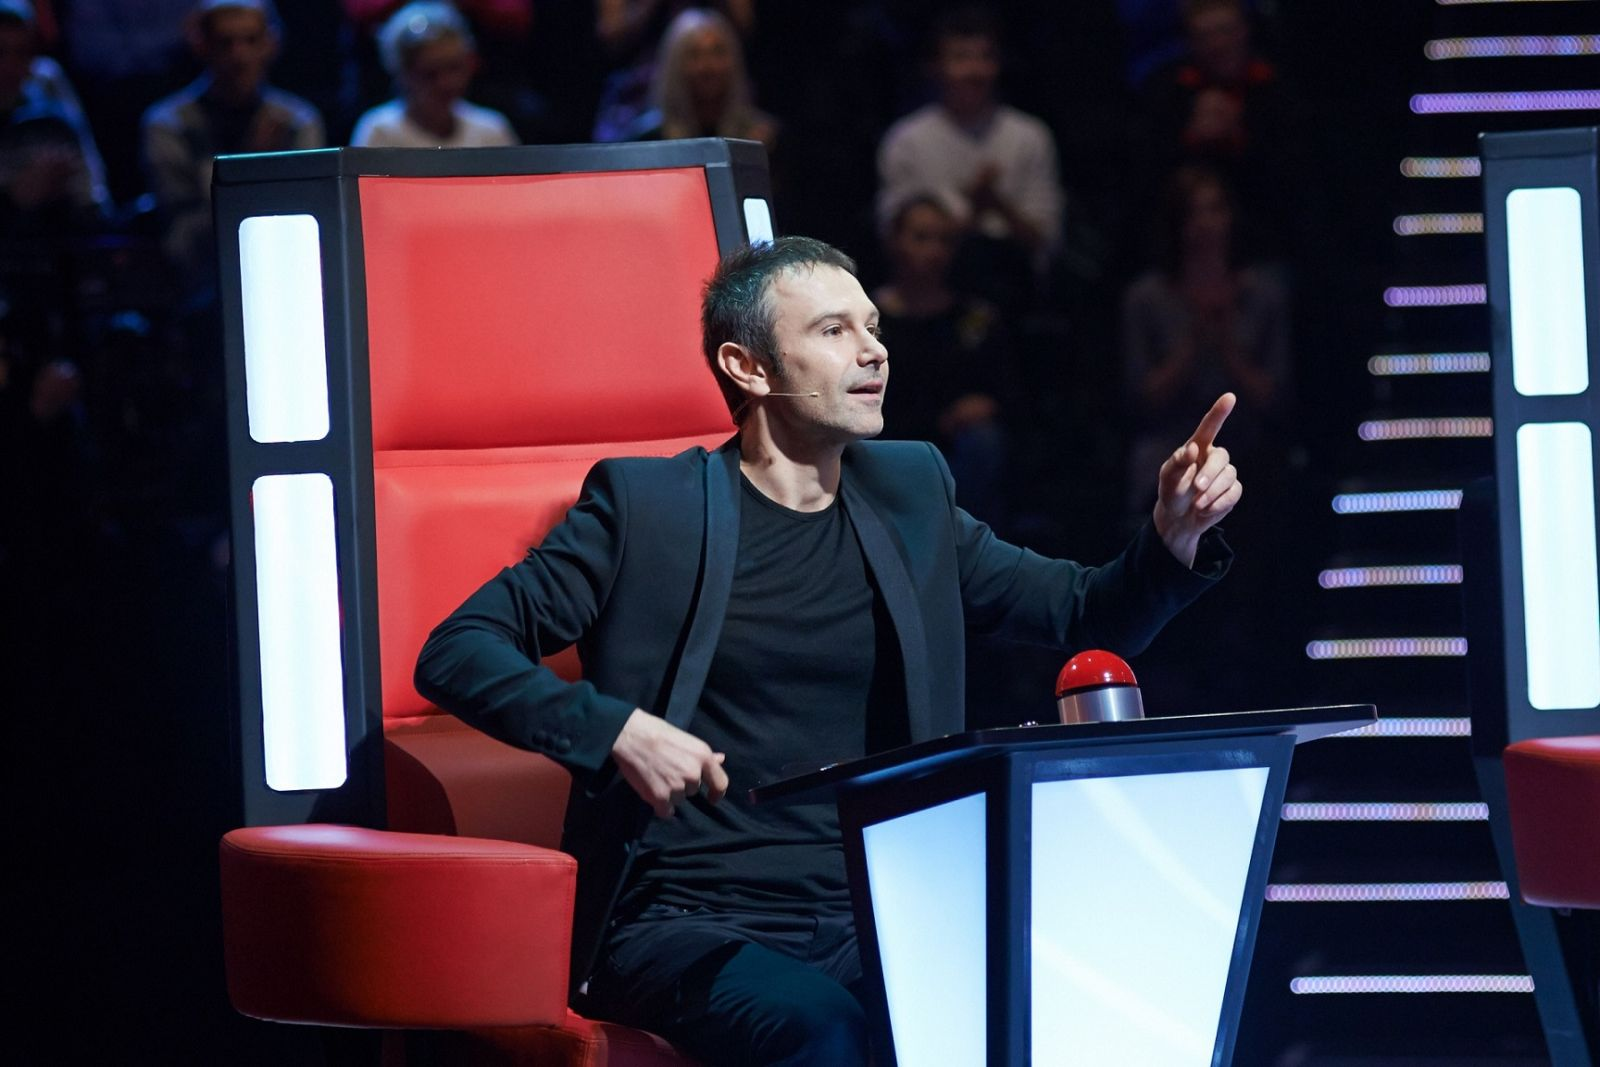 Святослав Вакарчук стал четвертым тренером шоу Голос країни-6